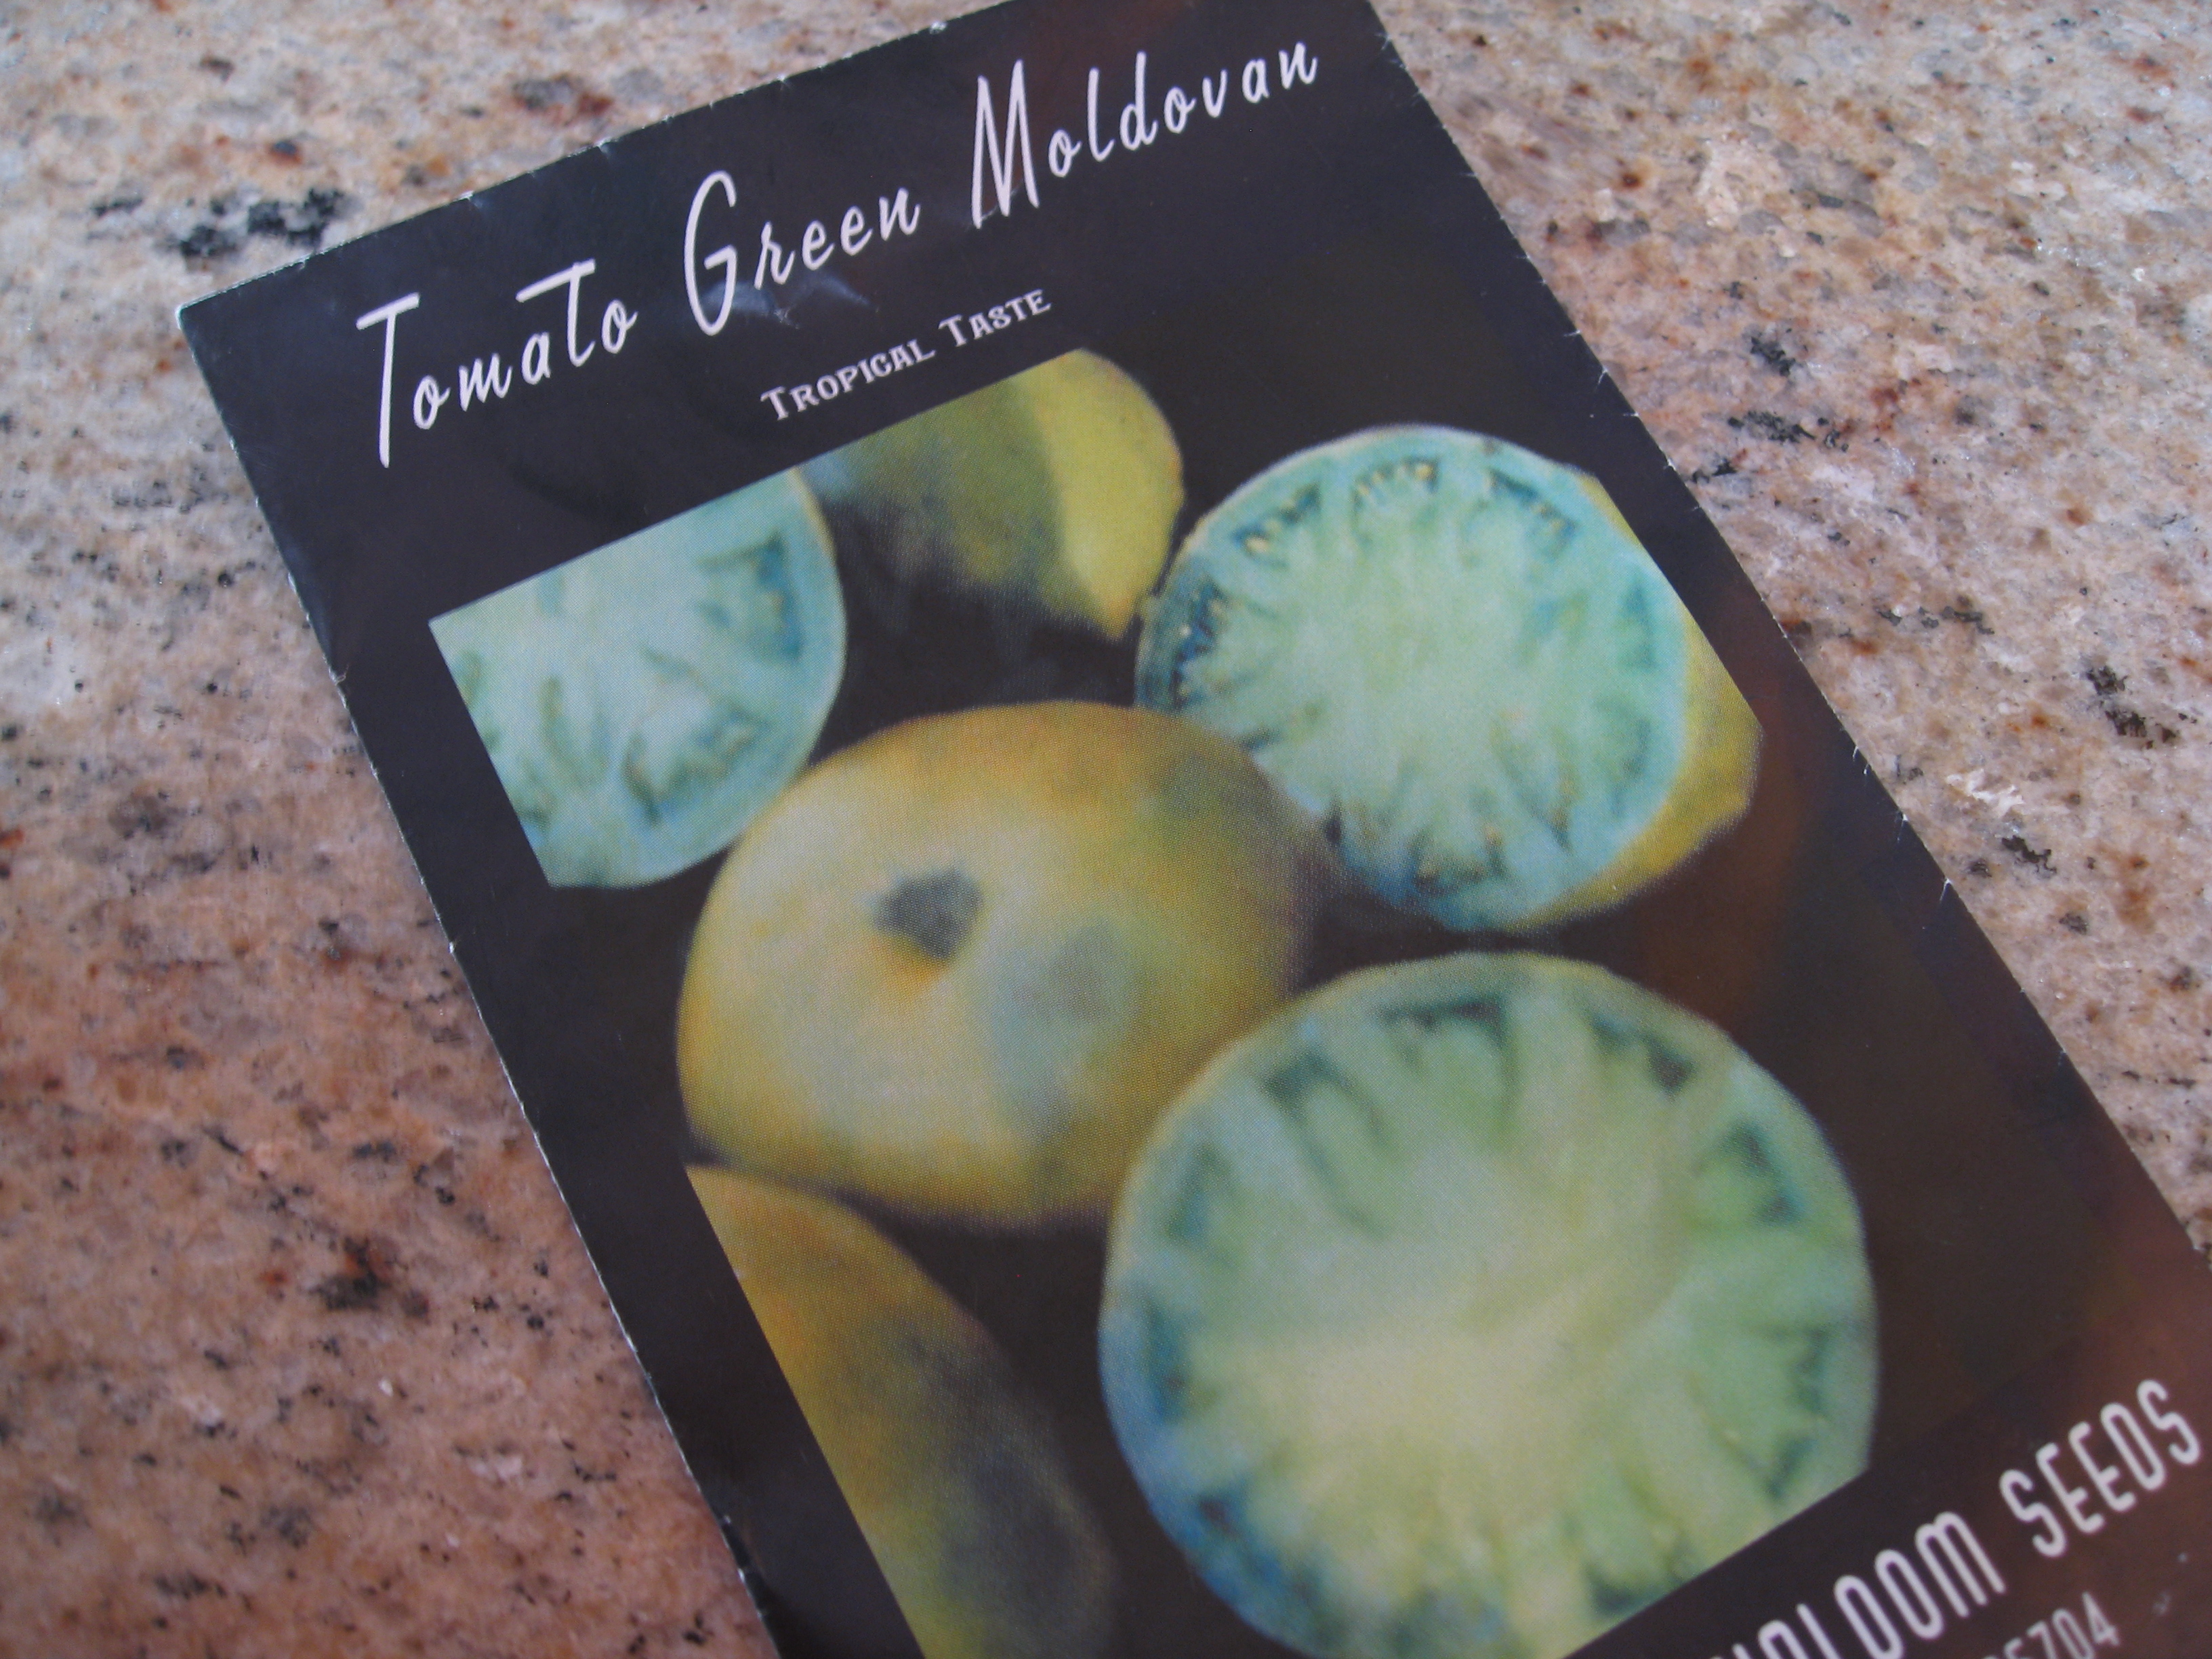 Green Moldovan tomato